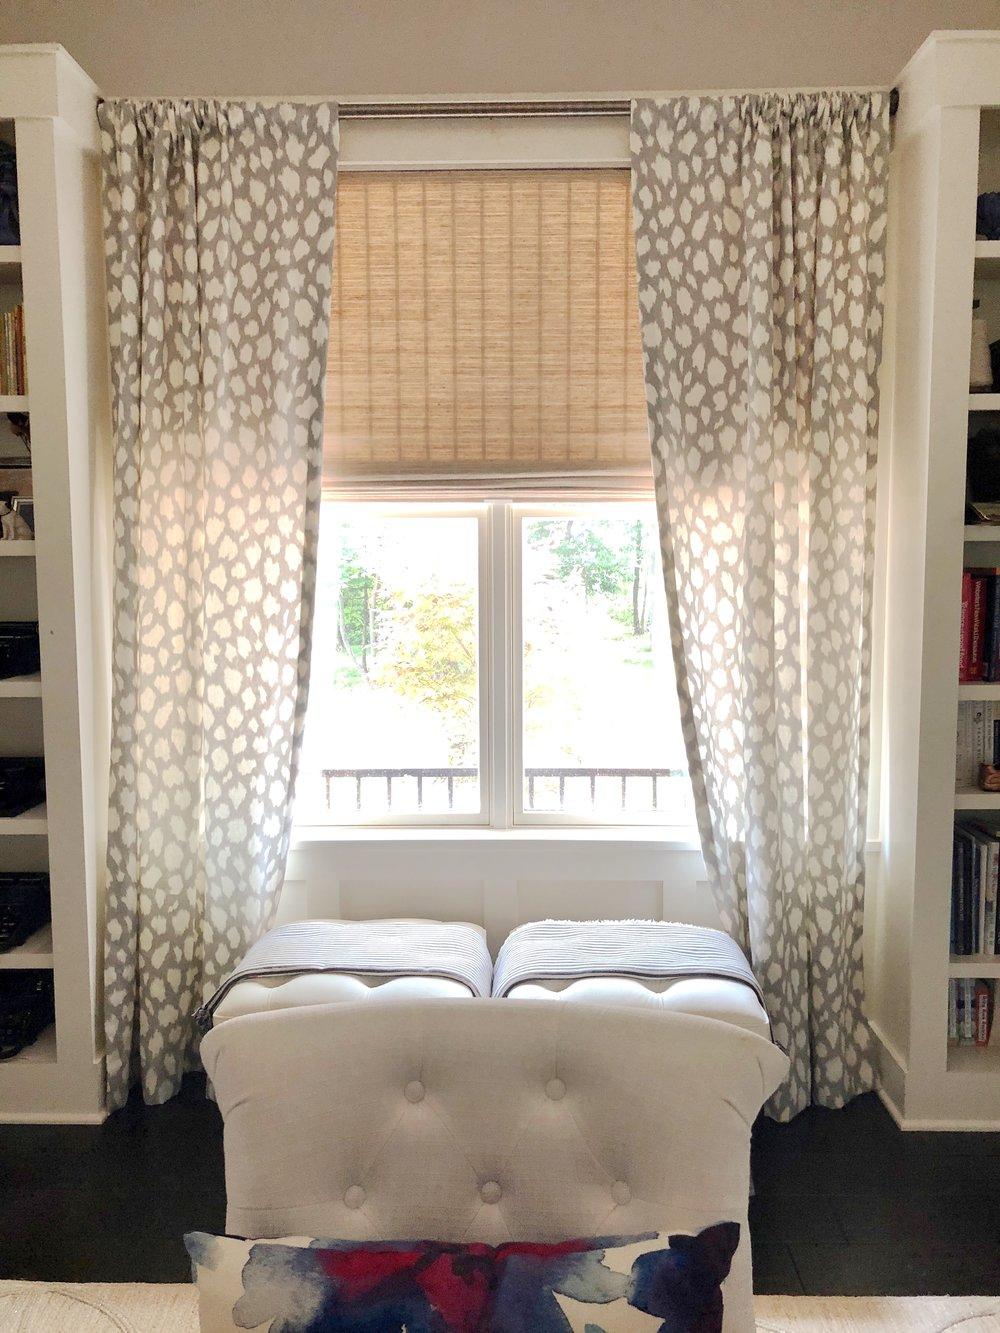 Layered custom window treatments by Calico featuring Kate Spade LeoKat fabric and Hunter Douglas shade.